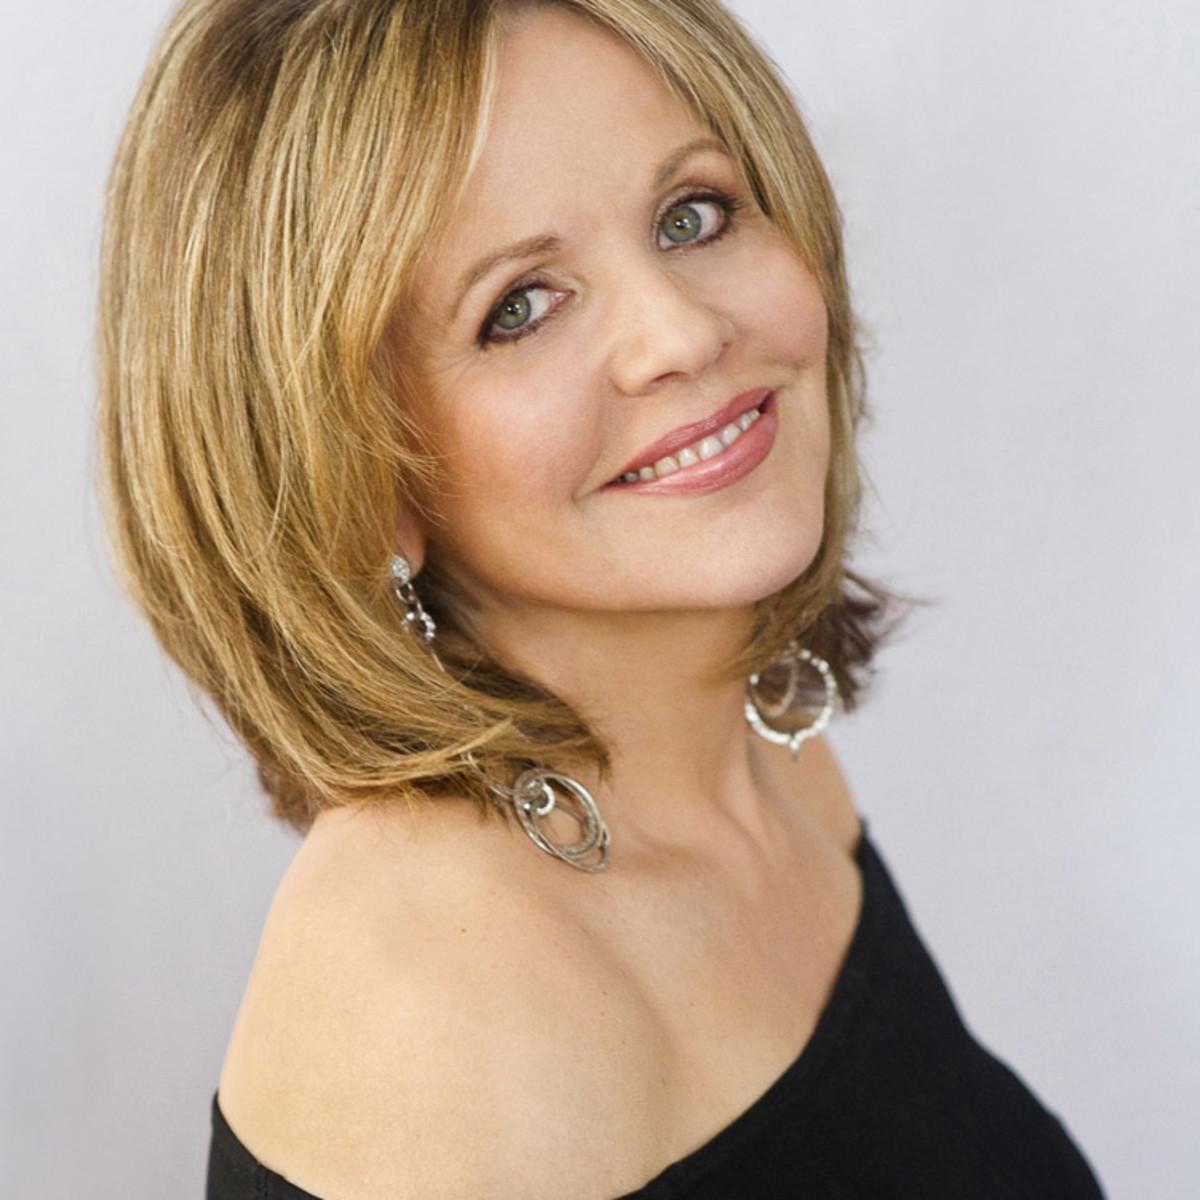 Jackie Hoffman born November 29, 1960 (age 57)